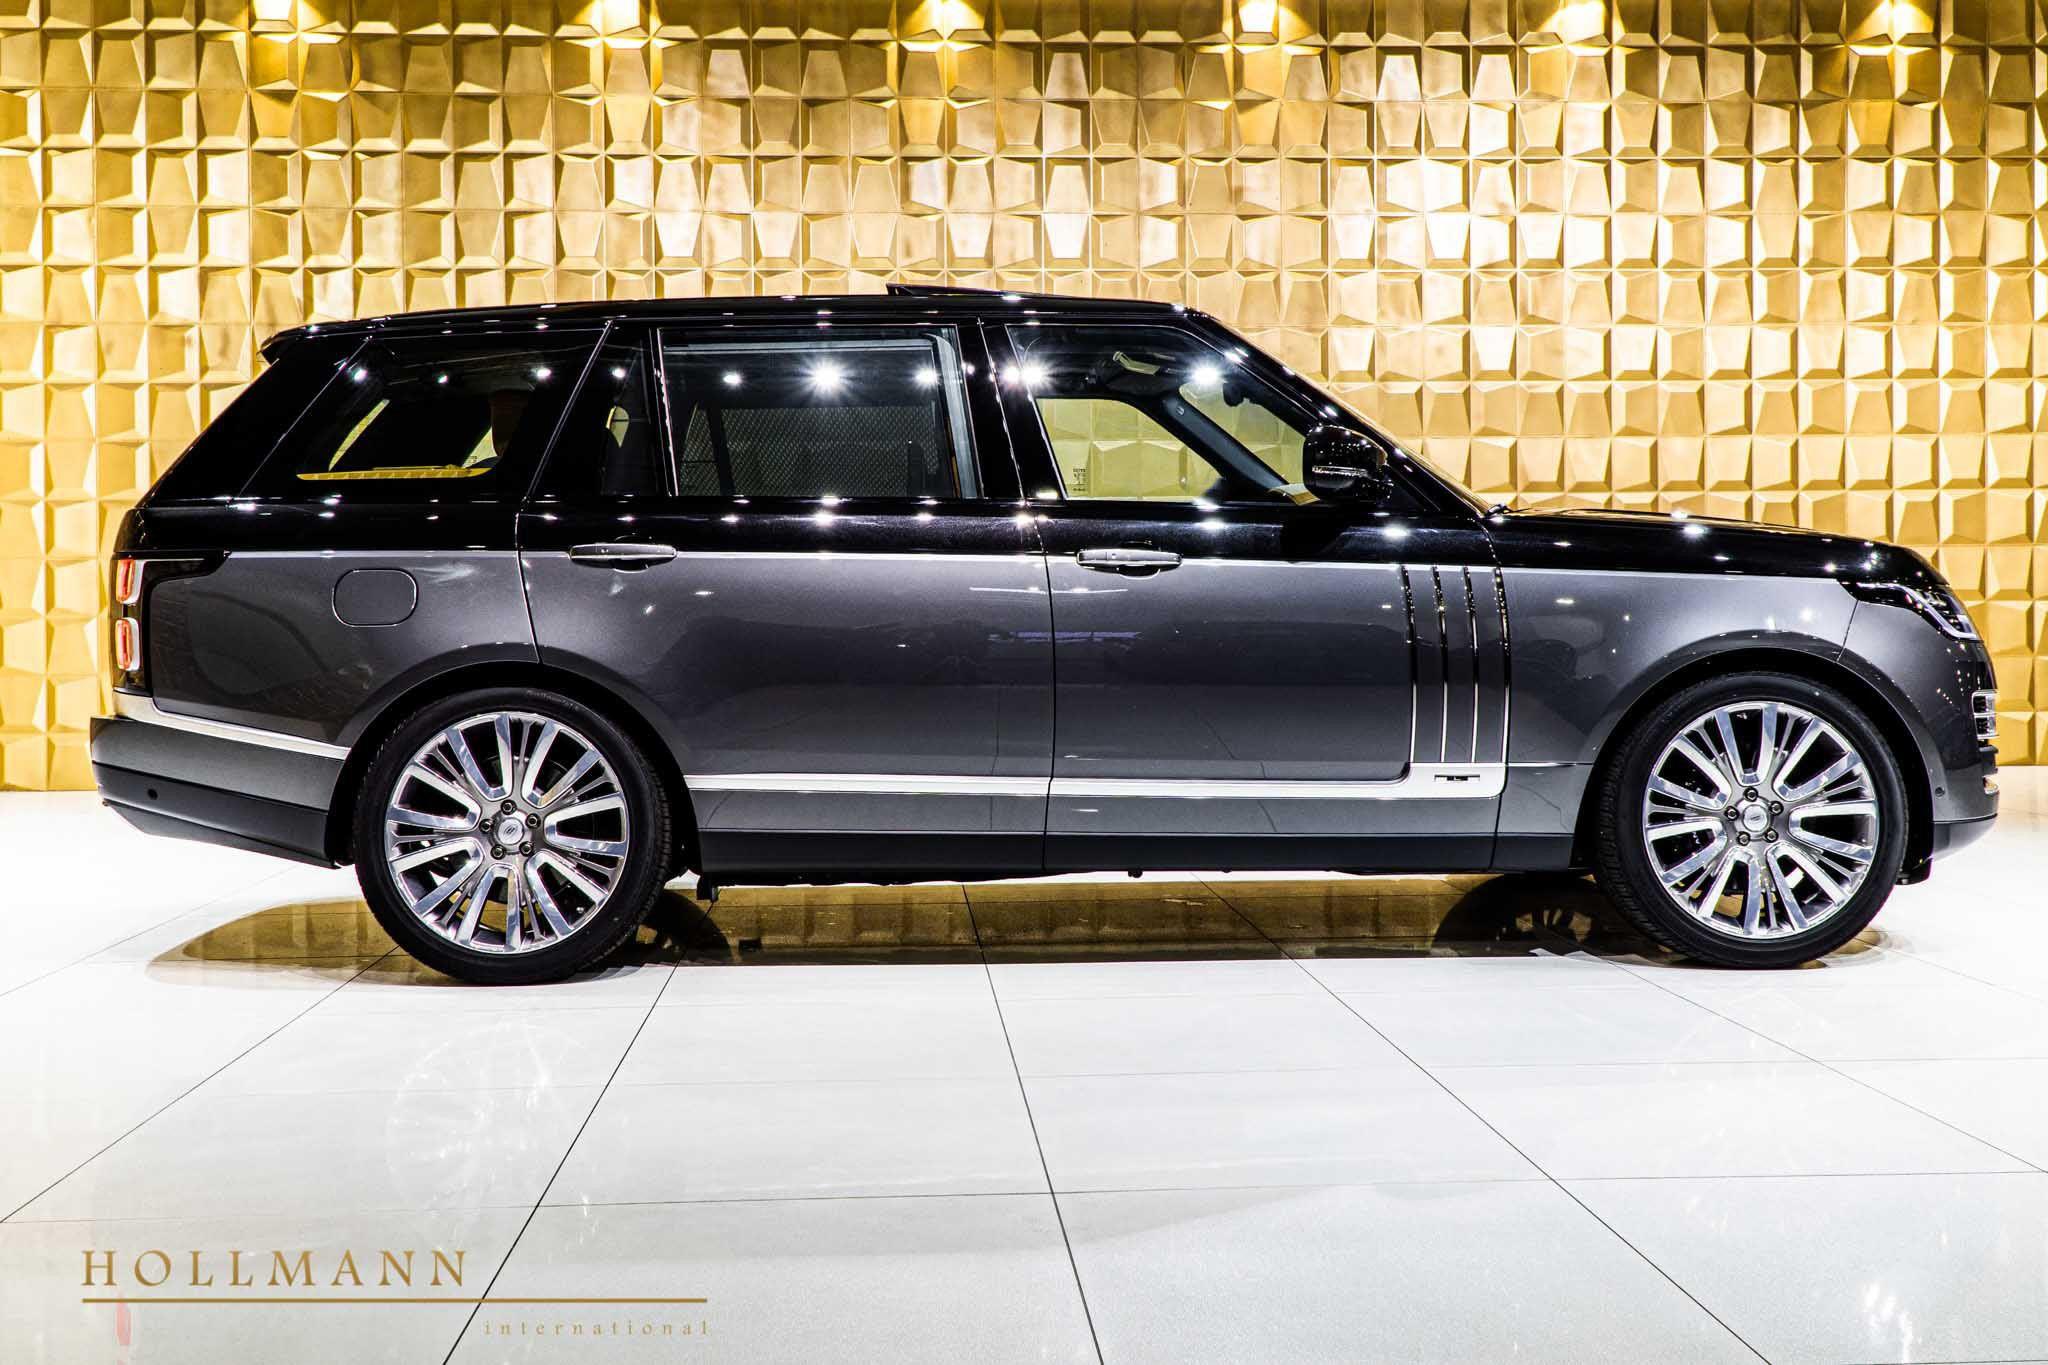 Land Rover Range Rover 5 0 Lwb Sv Autobiography Hollmann International Germany For Sale On Luxurypulse Range Rover Range Rover Interior Sv Autobiography